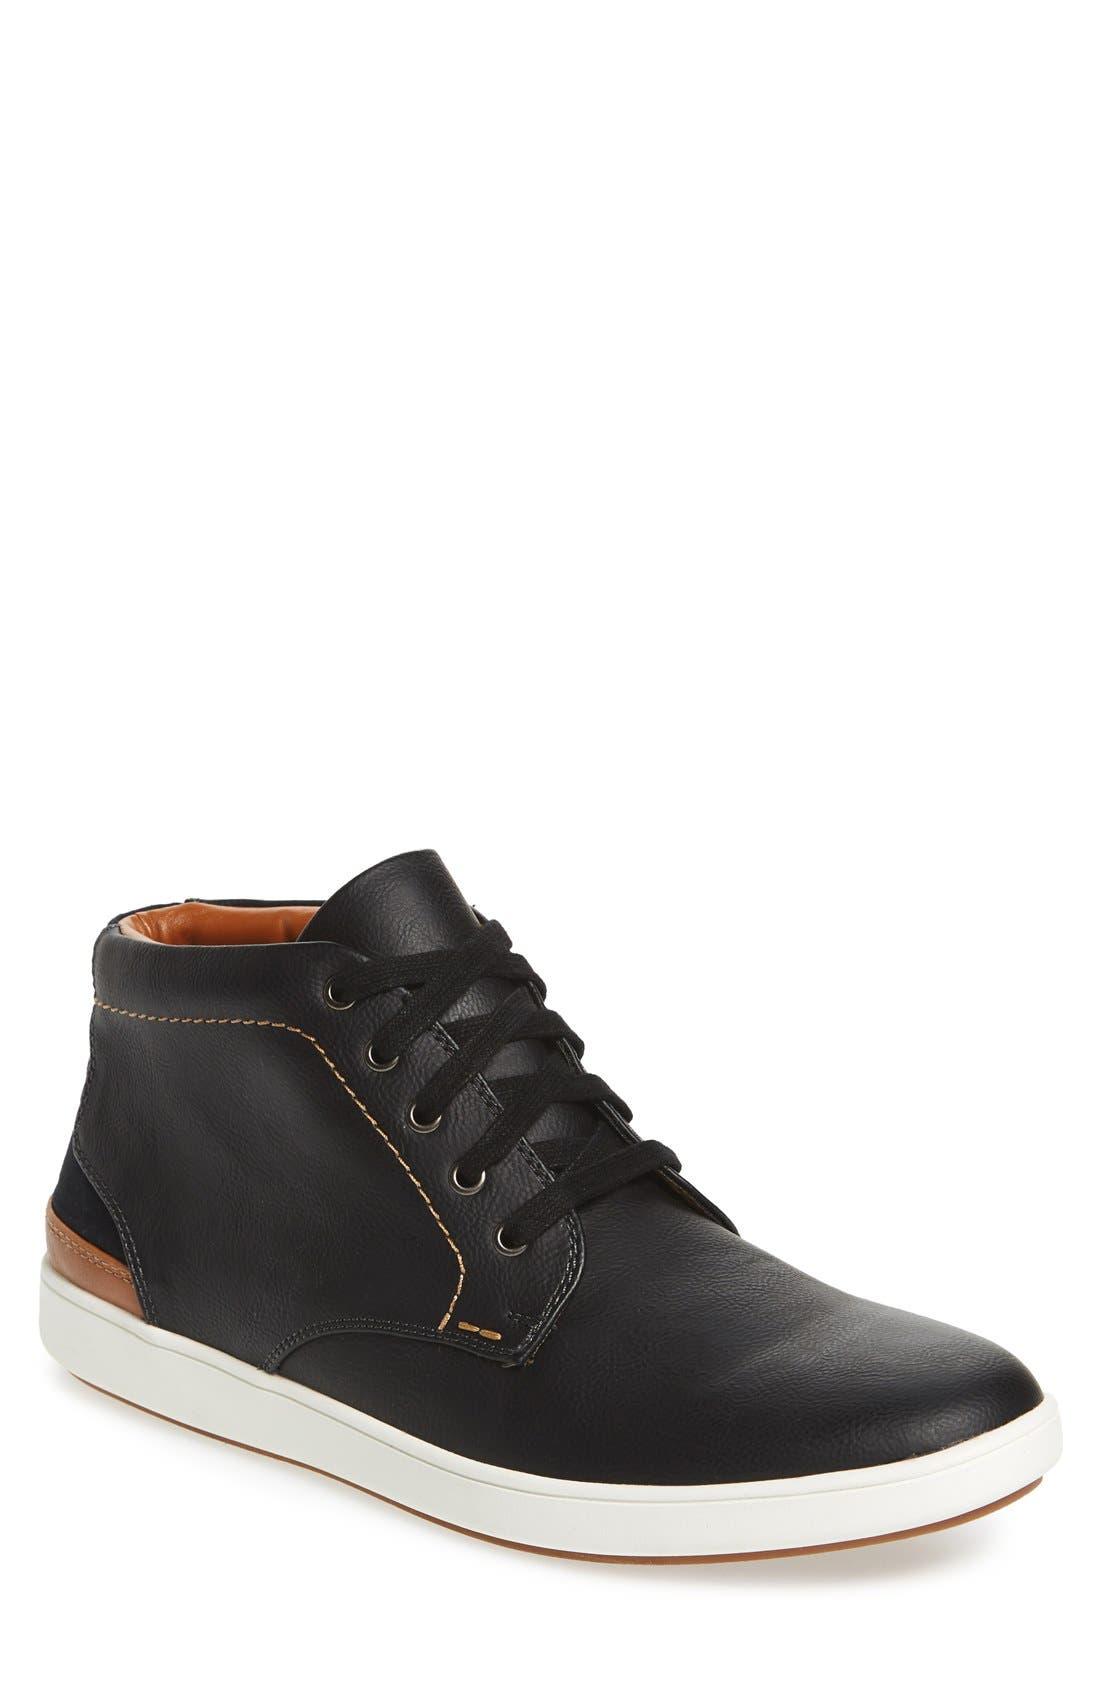 Freedomm Sneaker,                         Main,                         color, 017